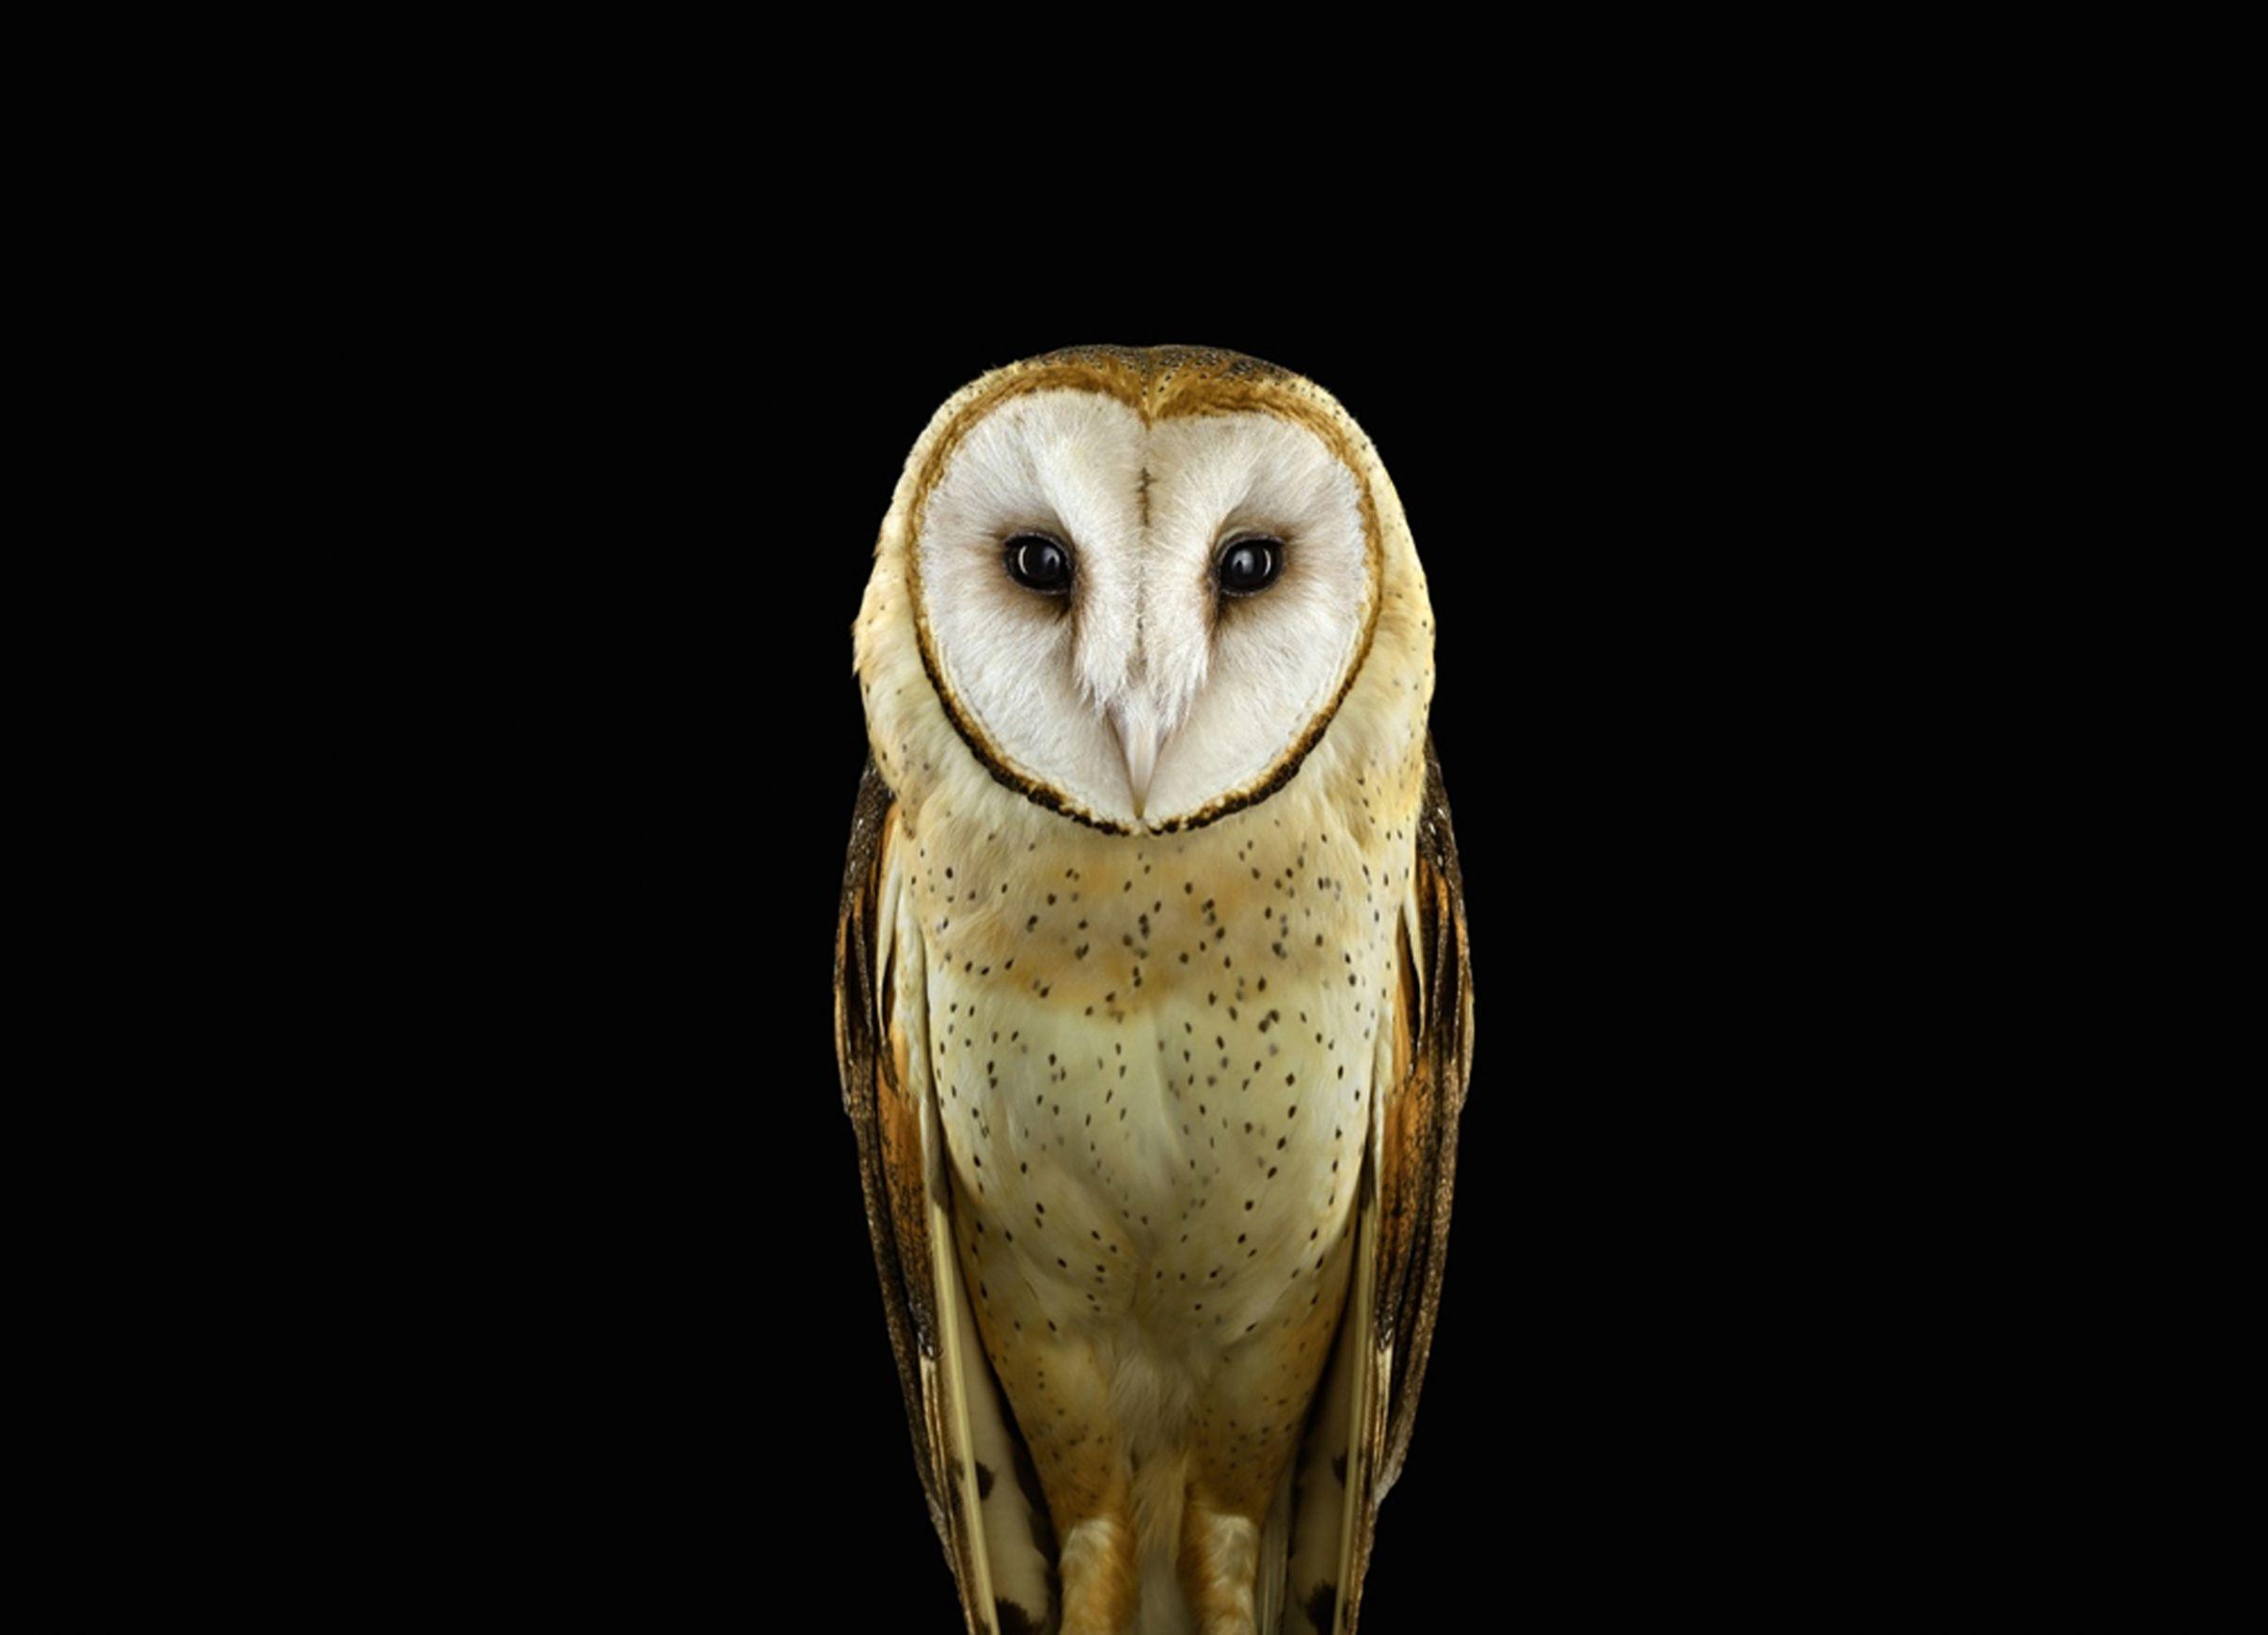 Incredible Studio Portraits Of Wild Animals By Brad Wilson: Pet Portraits, Barn Owl, Barn